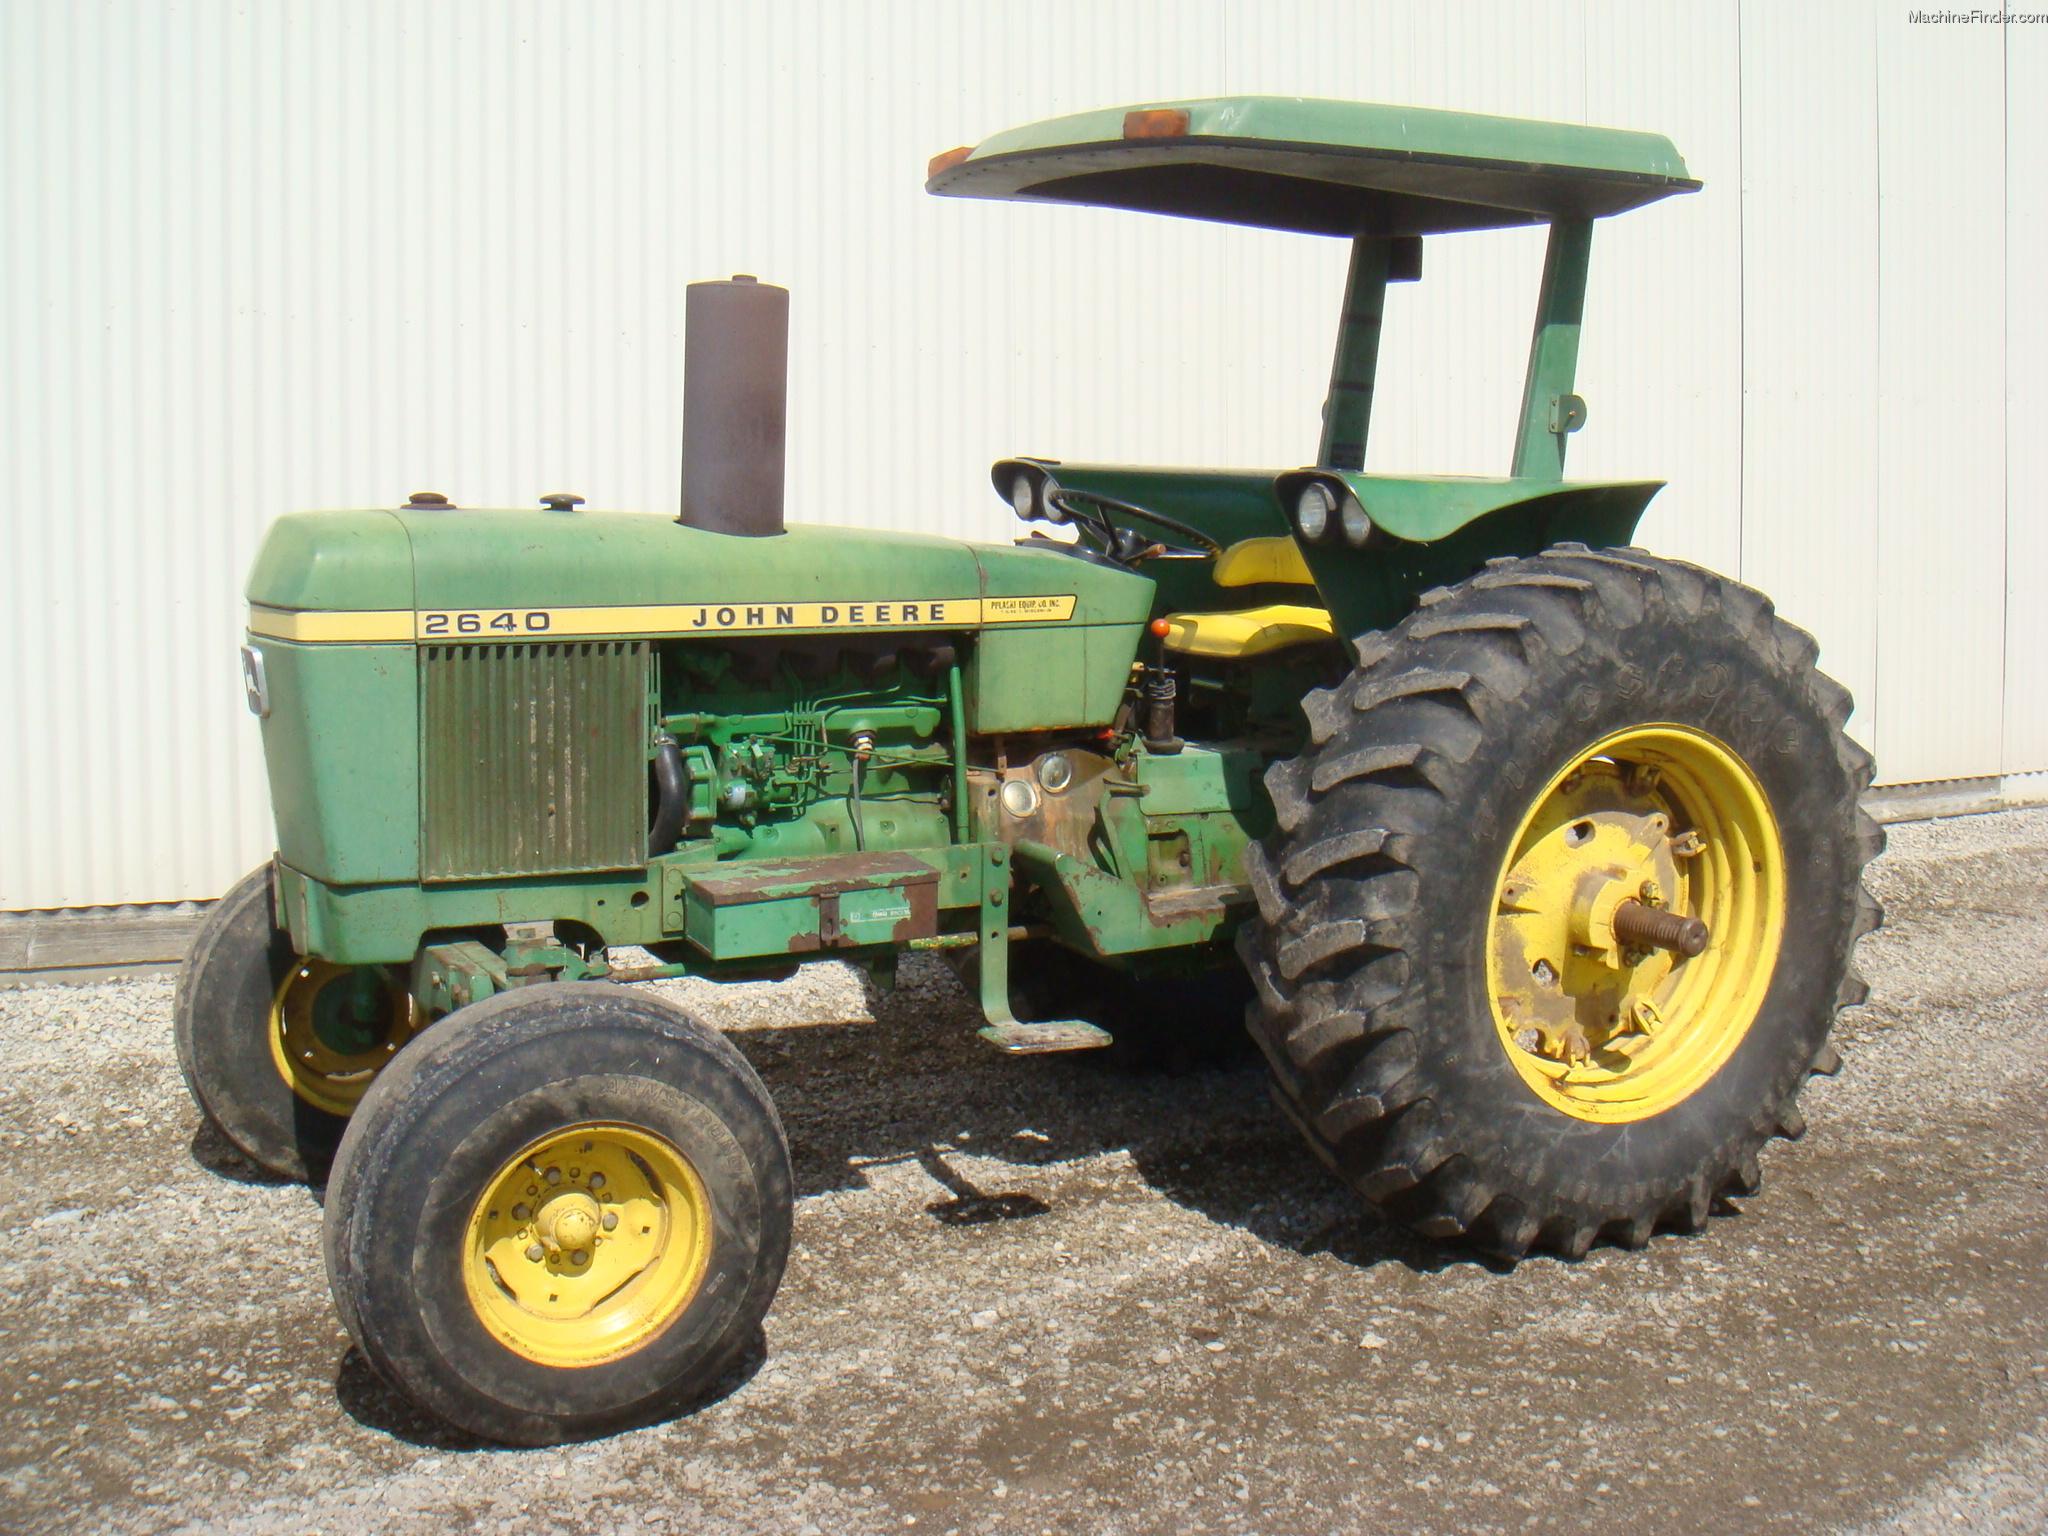 John Deere 2750 Farm Tractor Tractors 2240 Wiring Diagram 1976 2640 Utility 40 100hp